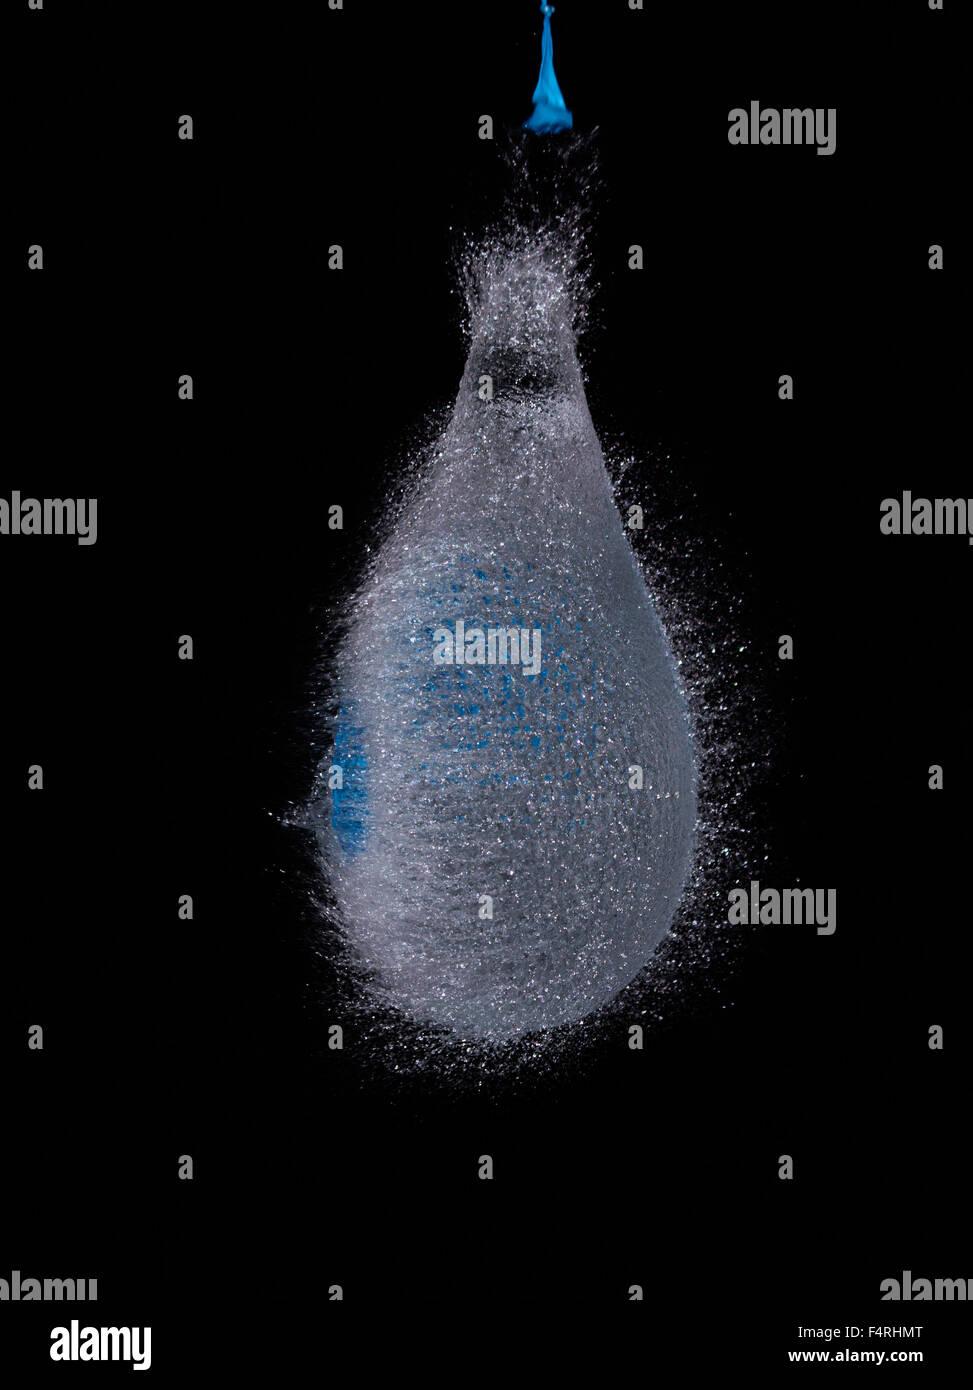 Water Bomb Bursting - Stock Image